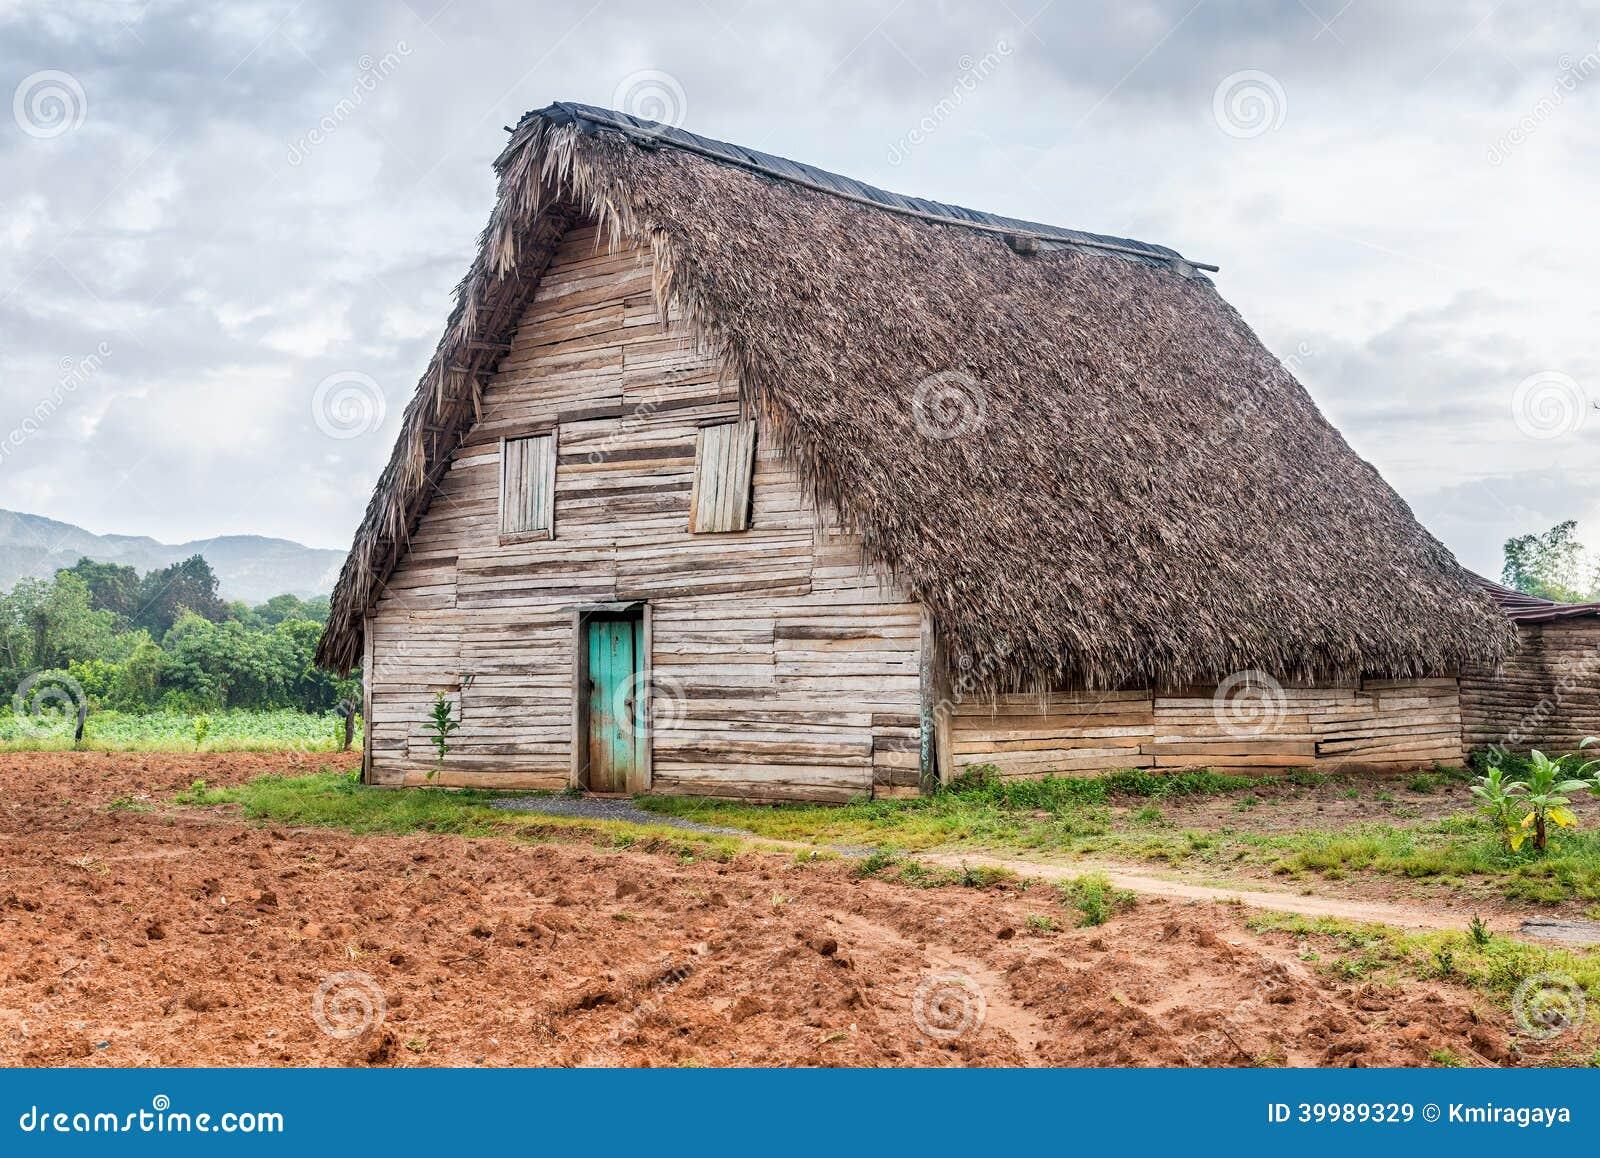 Tobacco curing barn in pinar del rio cuba stock photo for Tobacco barn house plans